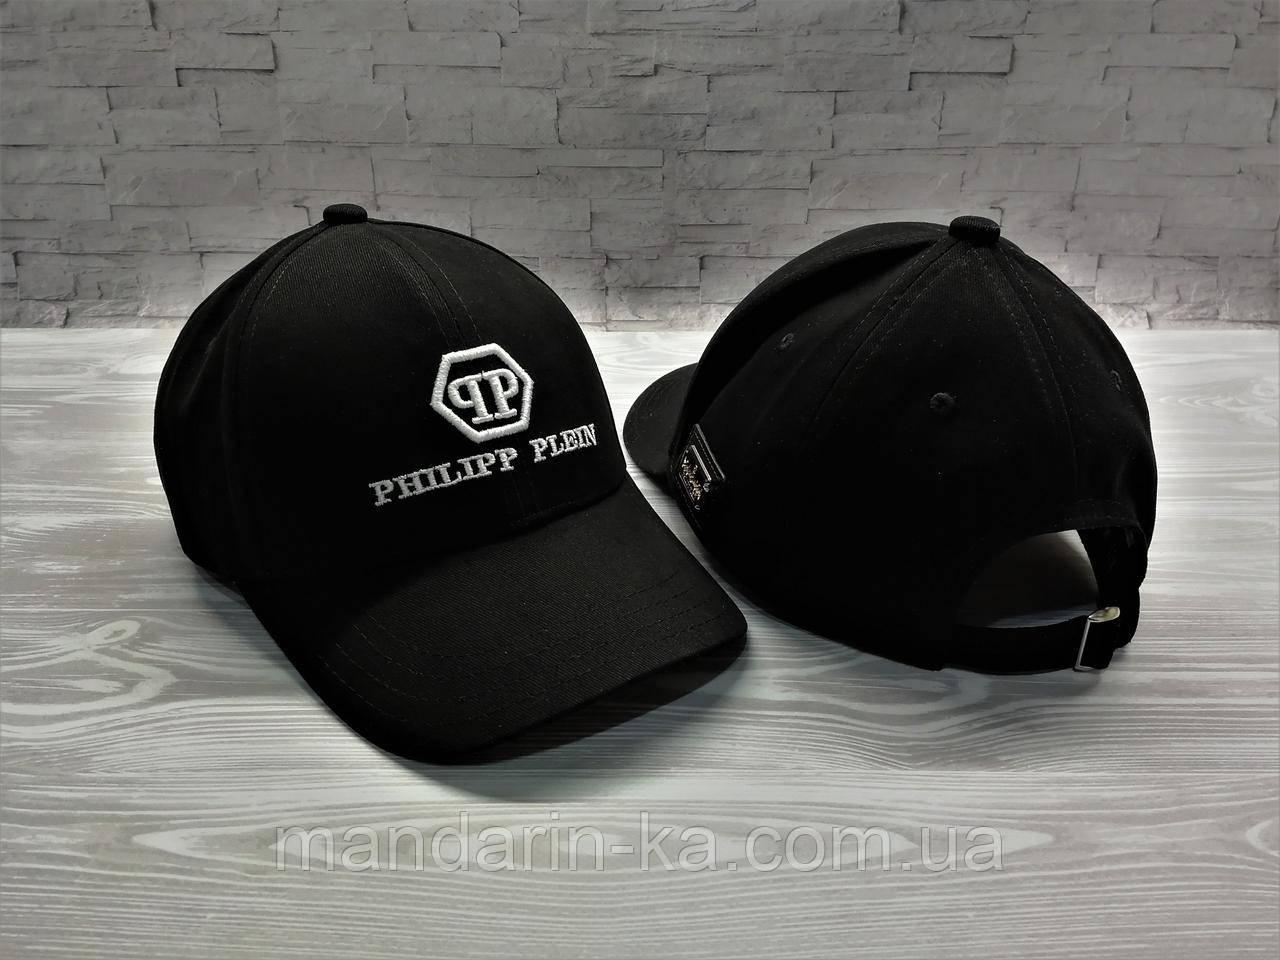 Кепка бейсболка блайзер  Philipp Plein Филипп Плейн черная (реплика)